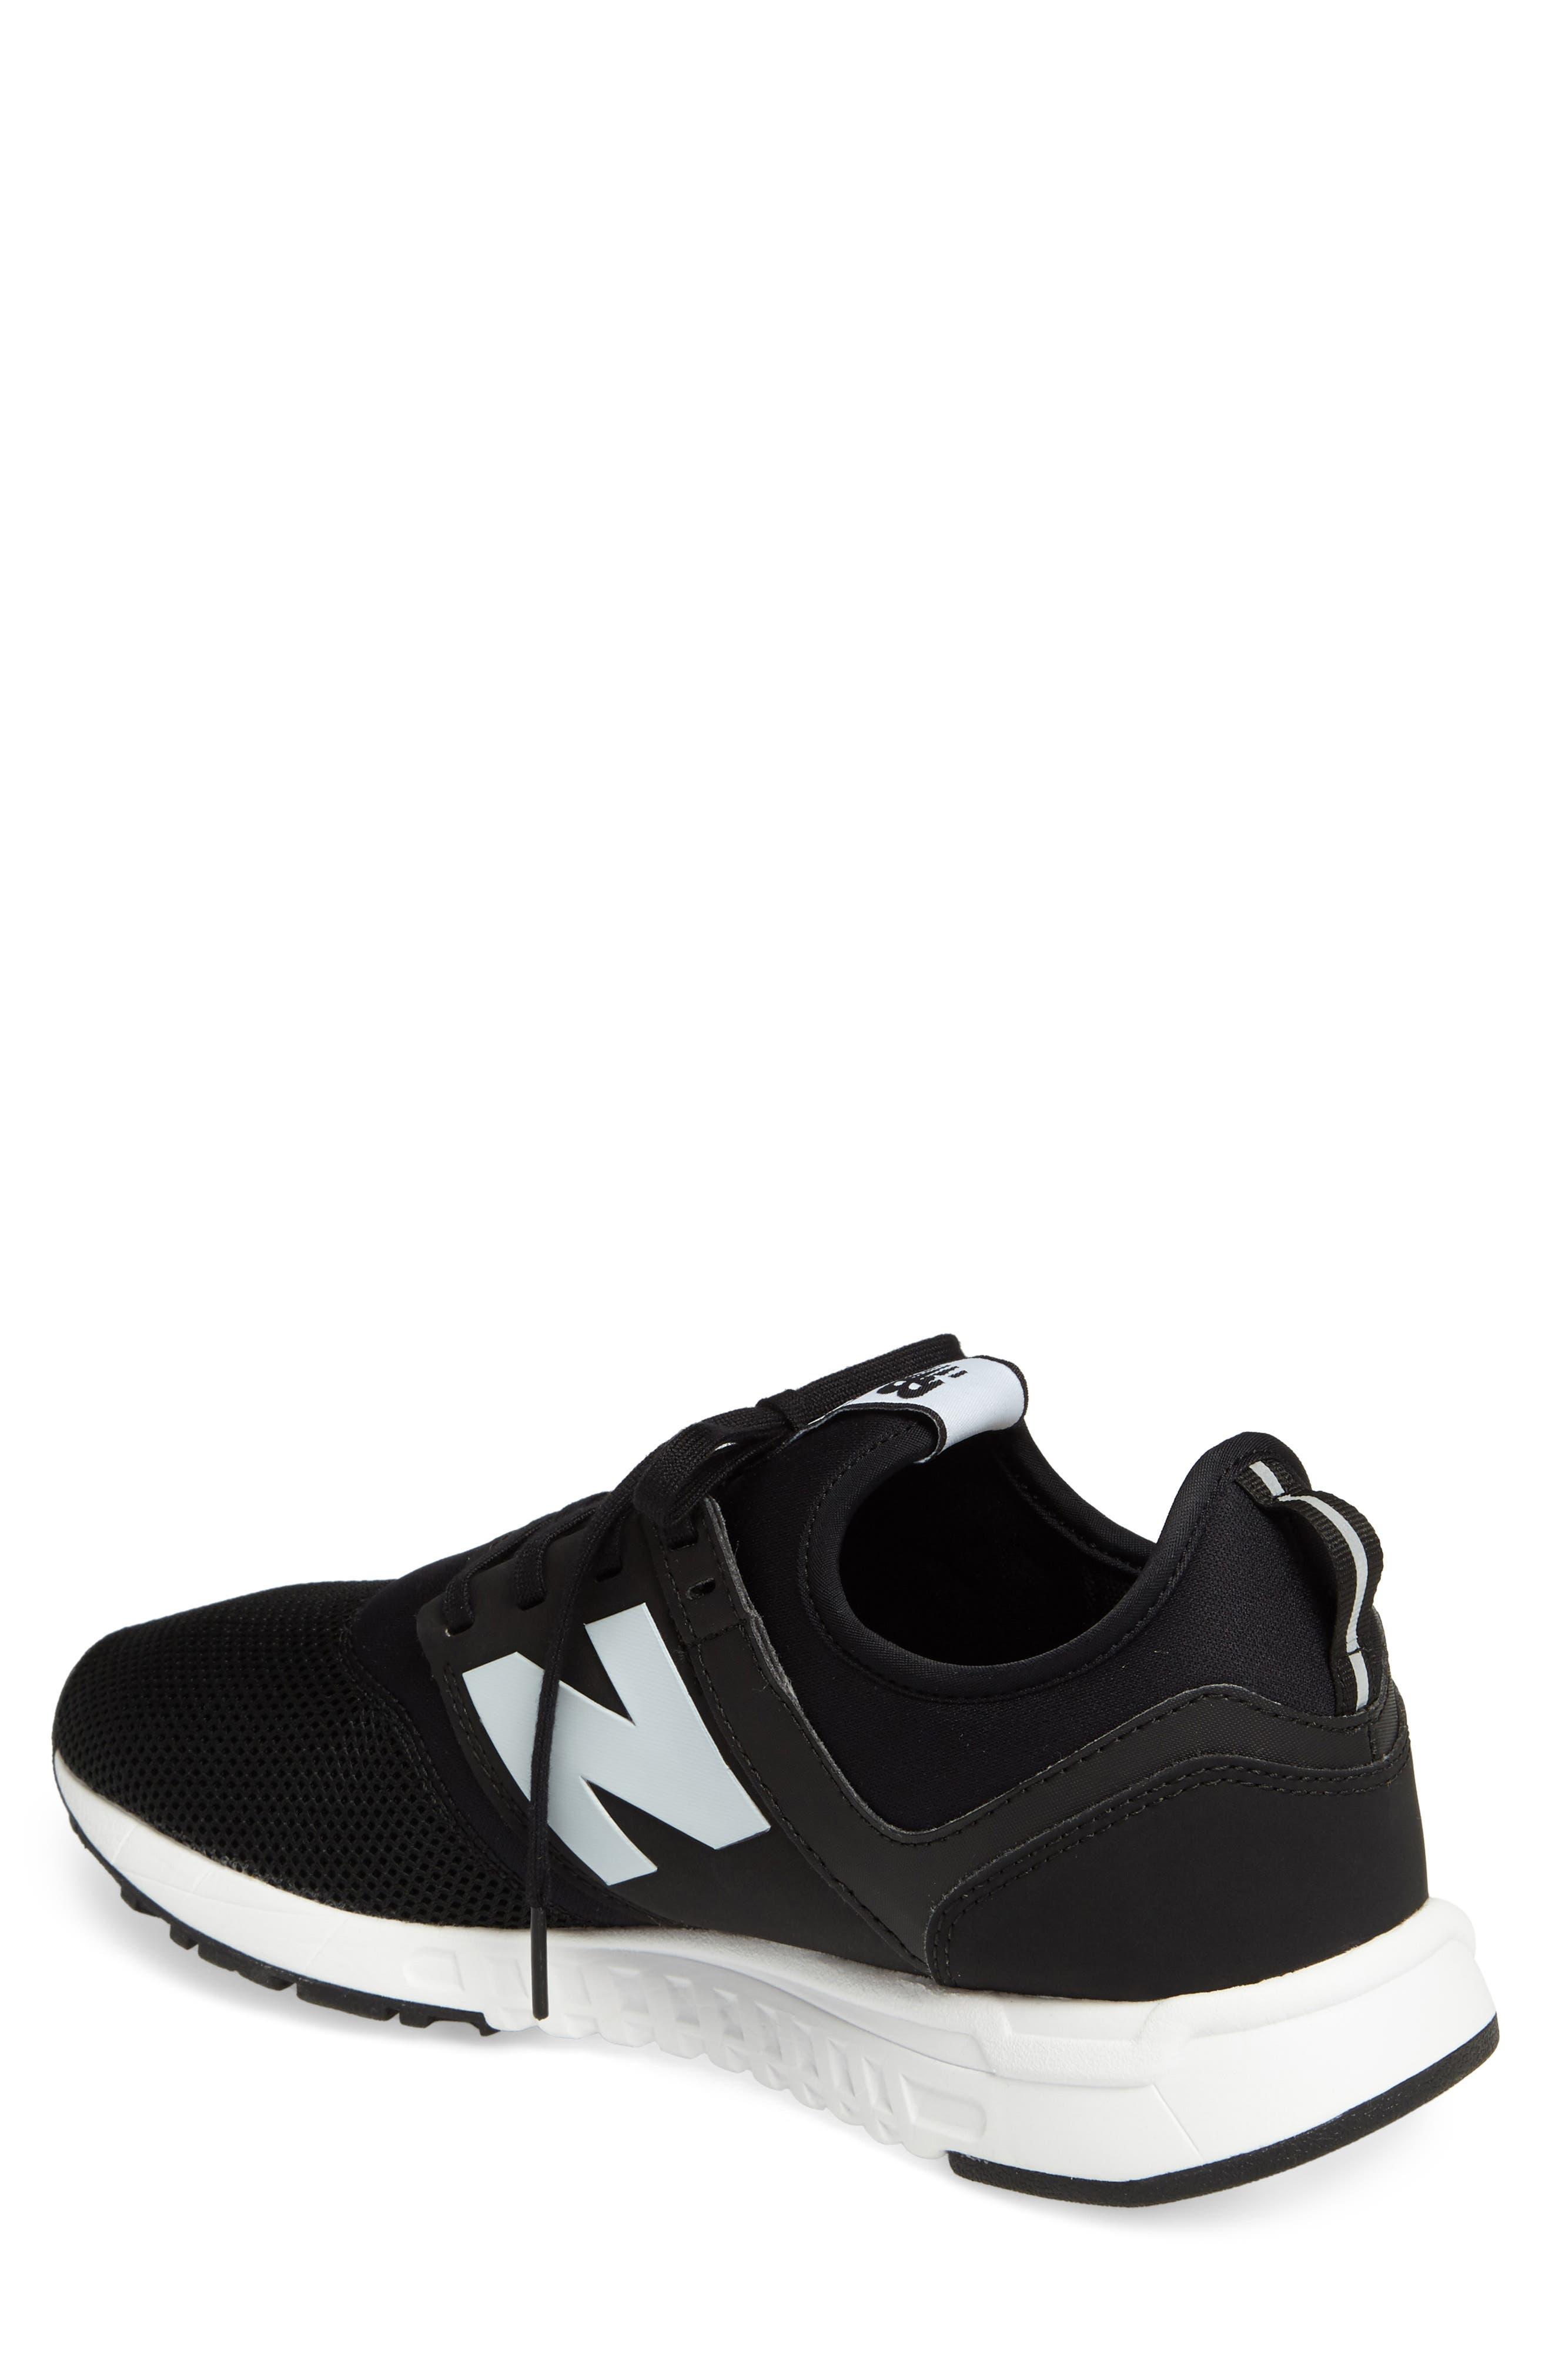 247 Modern Classic Sneaker,                             Alternate thumbnail 2, color,                             001